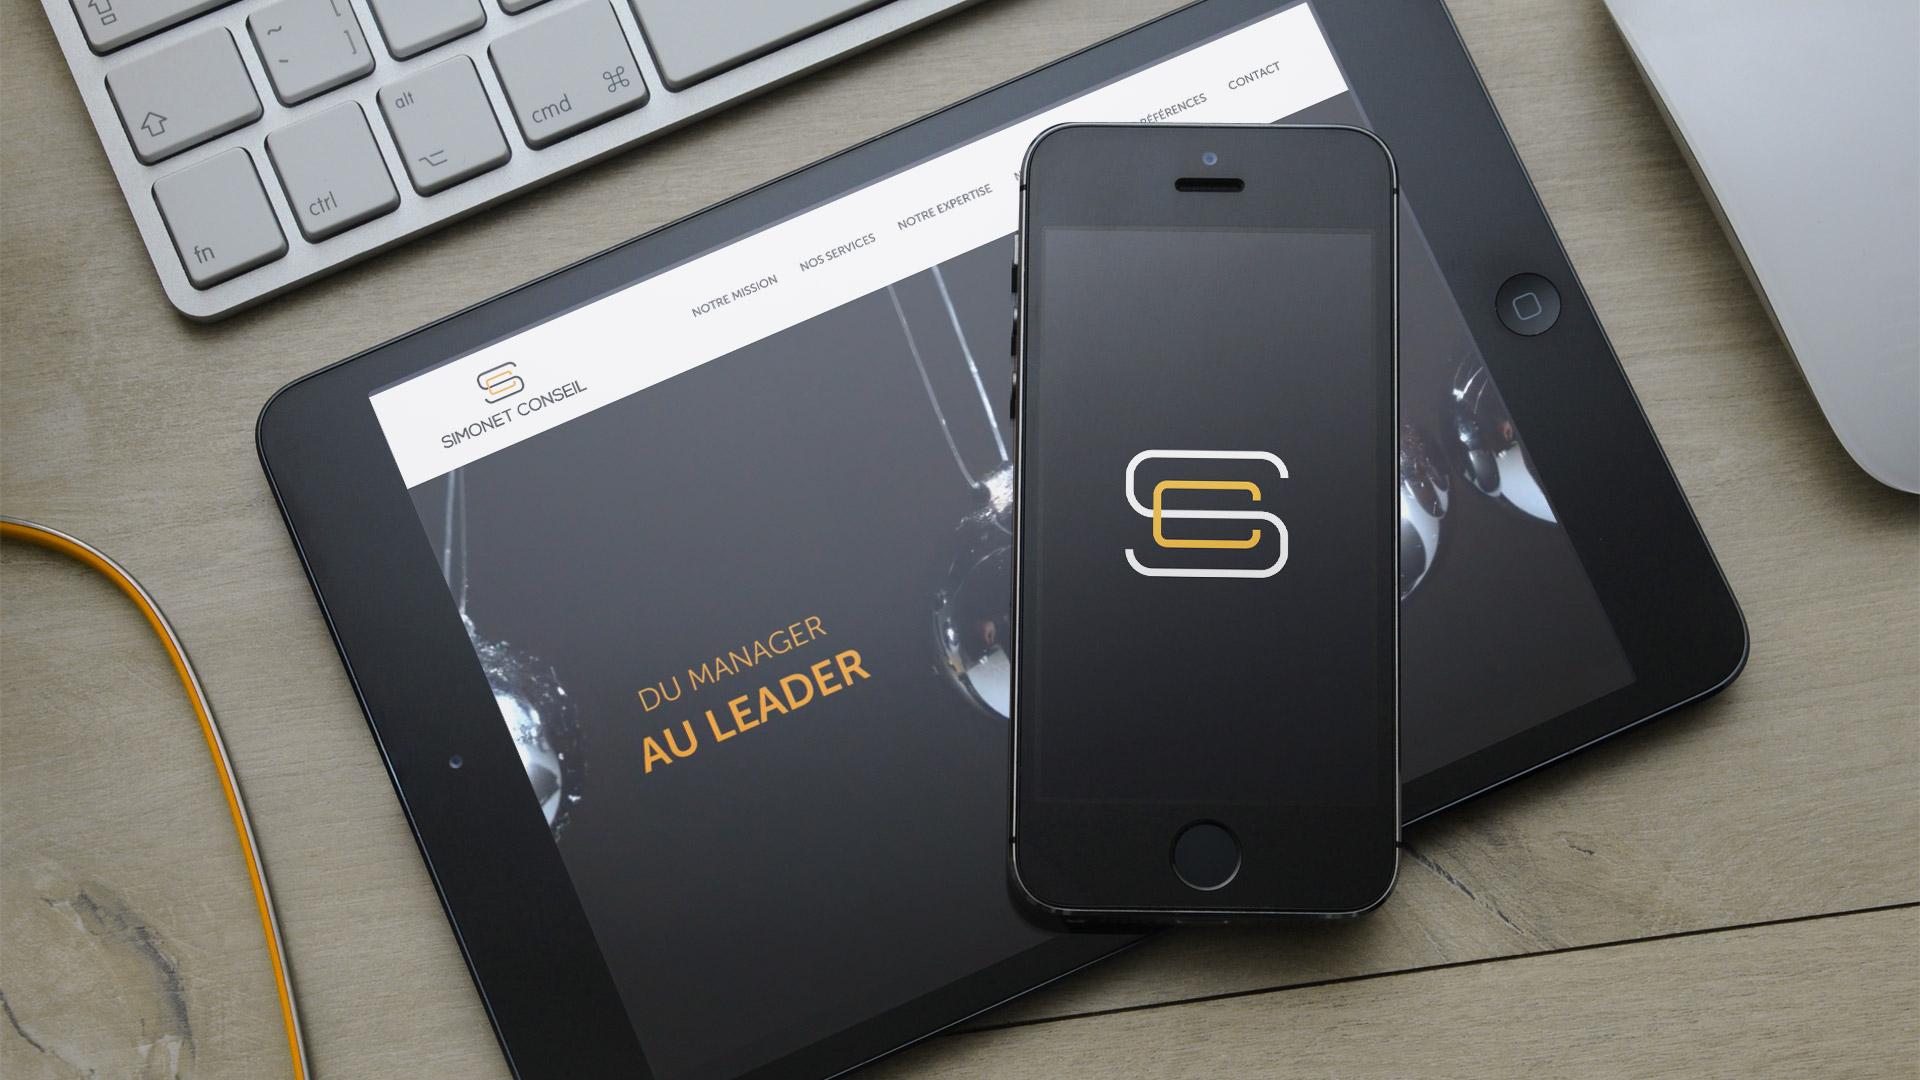 simonet-conseil-creation-site-internet-logo-caconcept-alexis-cretin-graphiste-montpellier